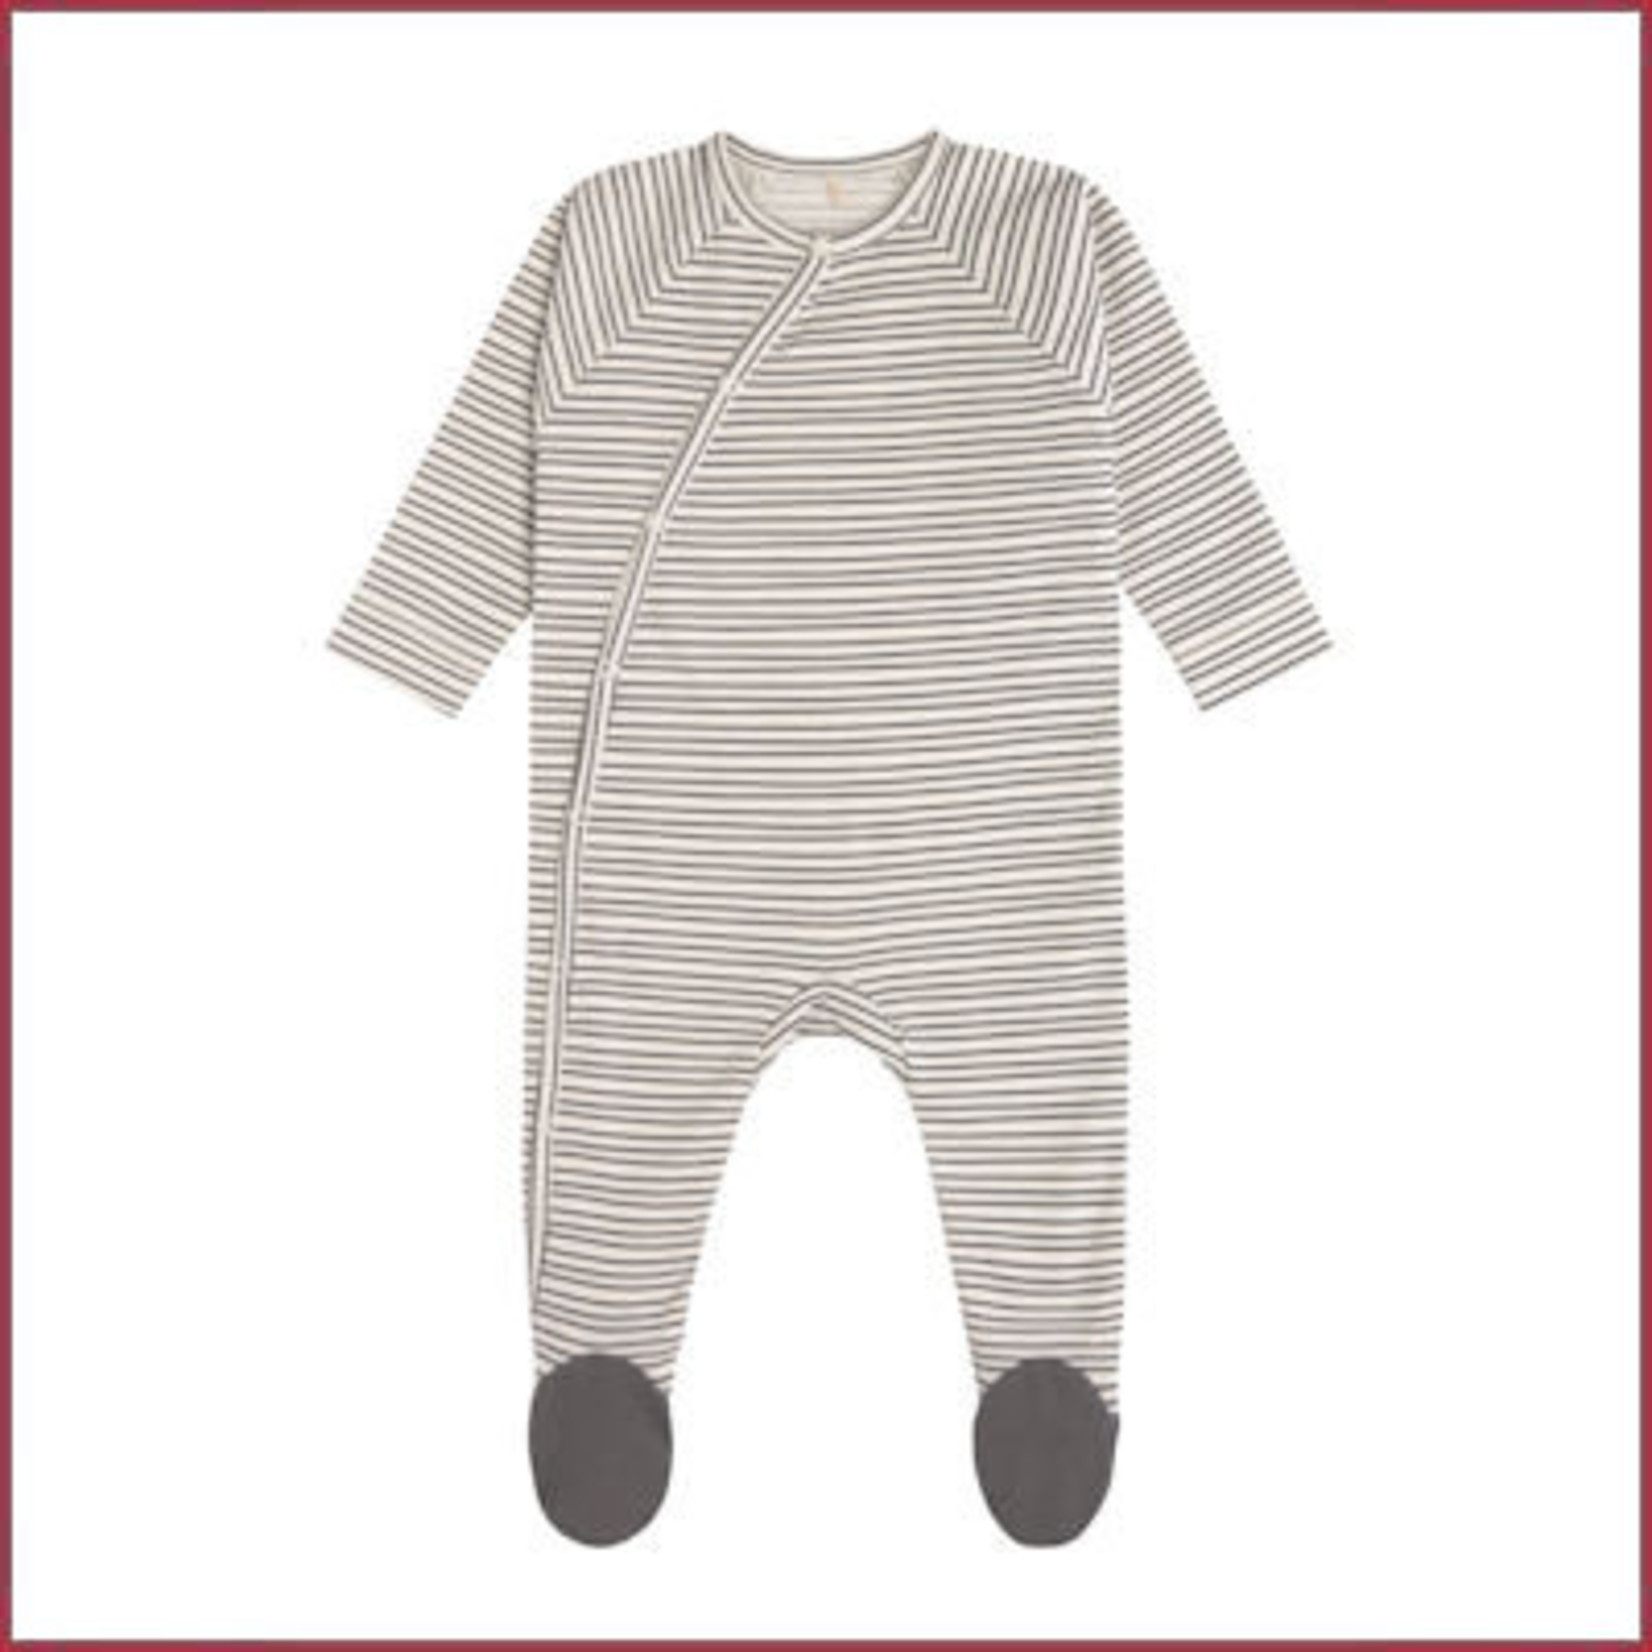 Lässig Pyjama met voetjes GOTS gestreept